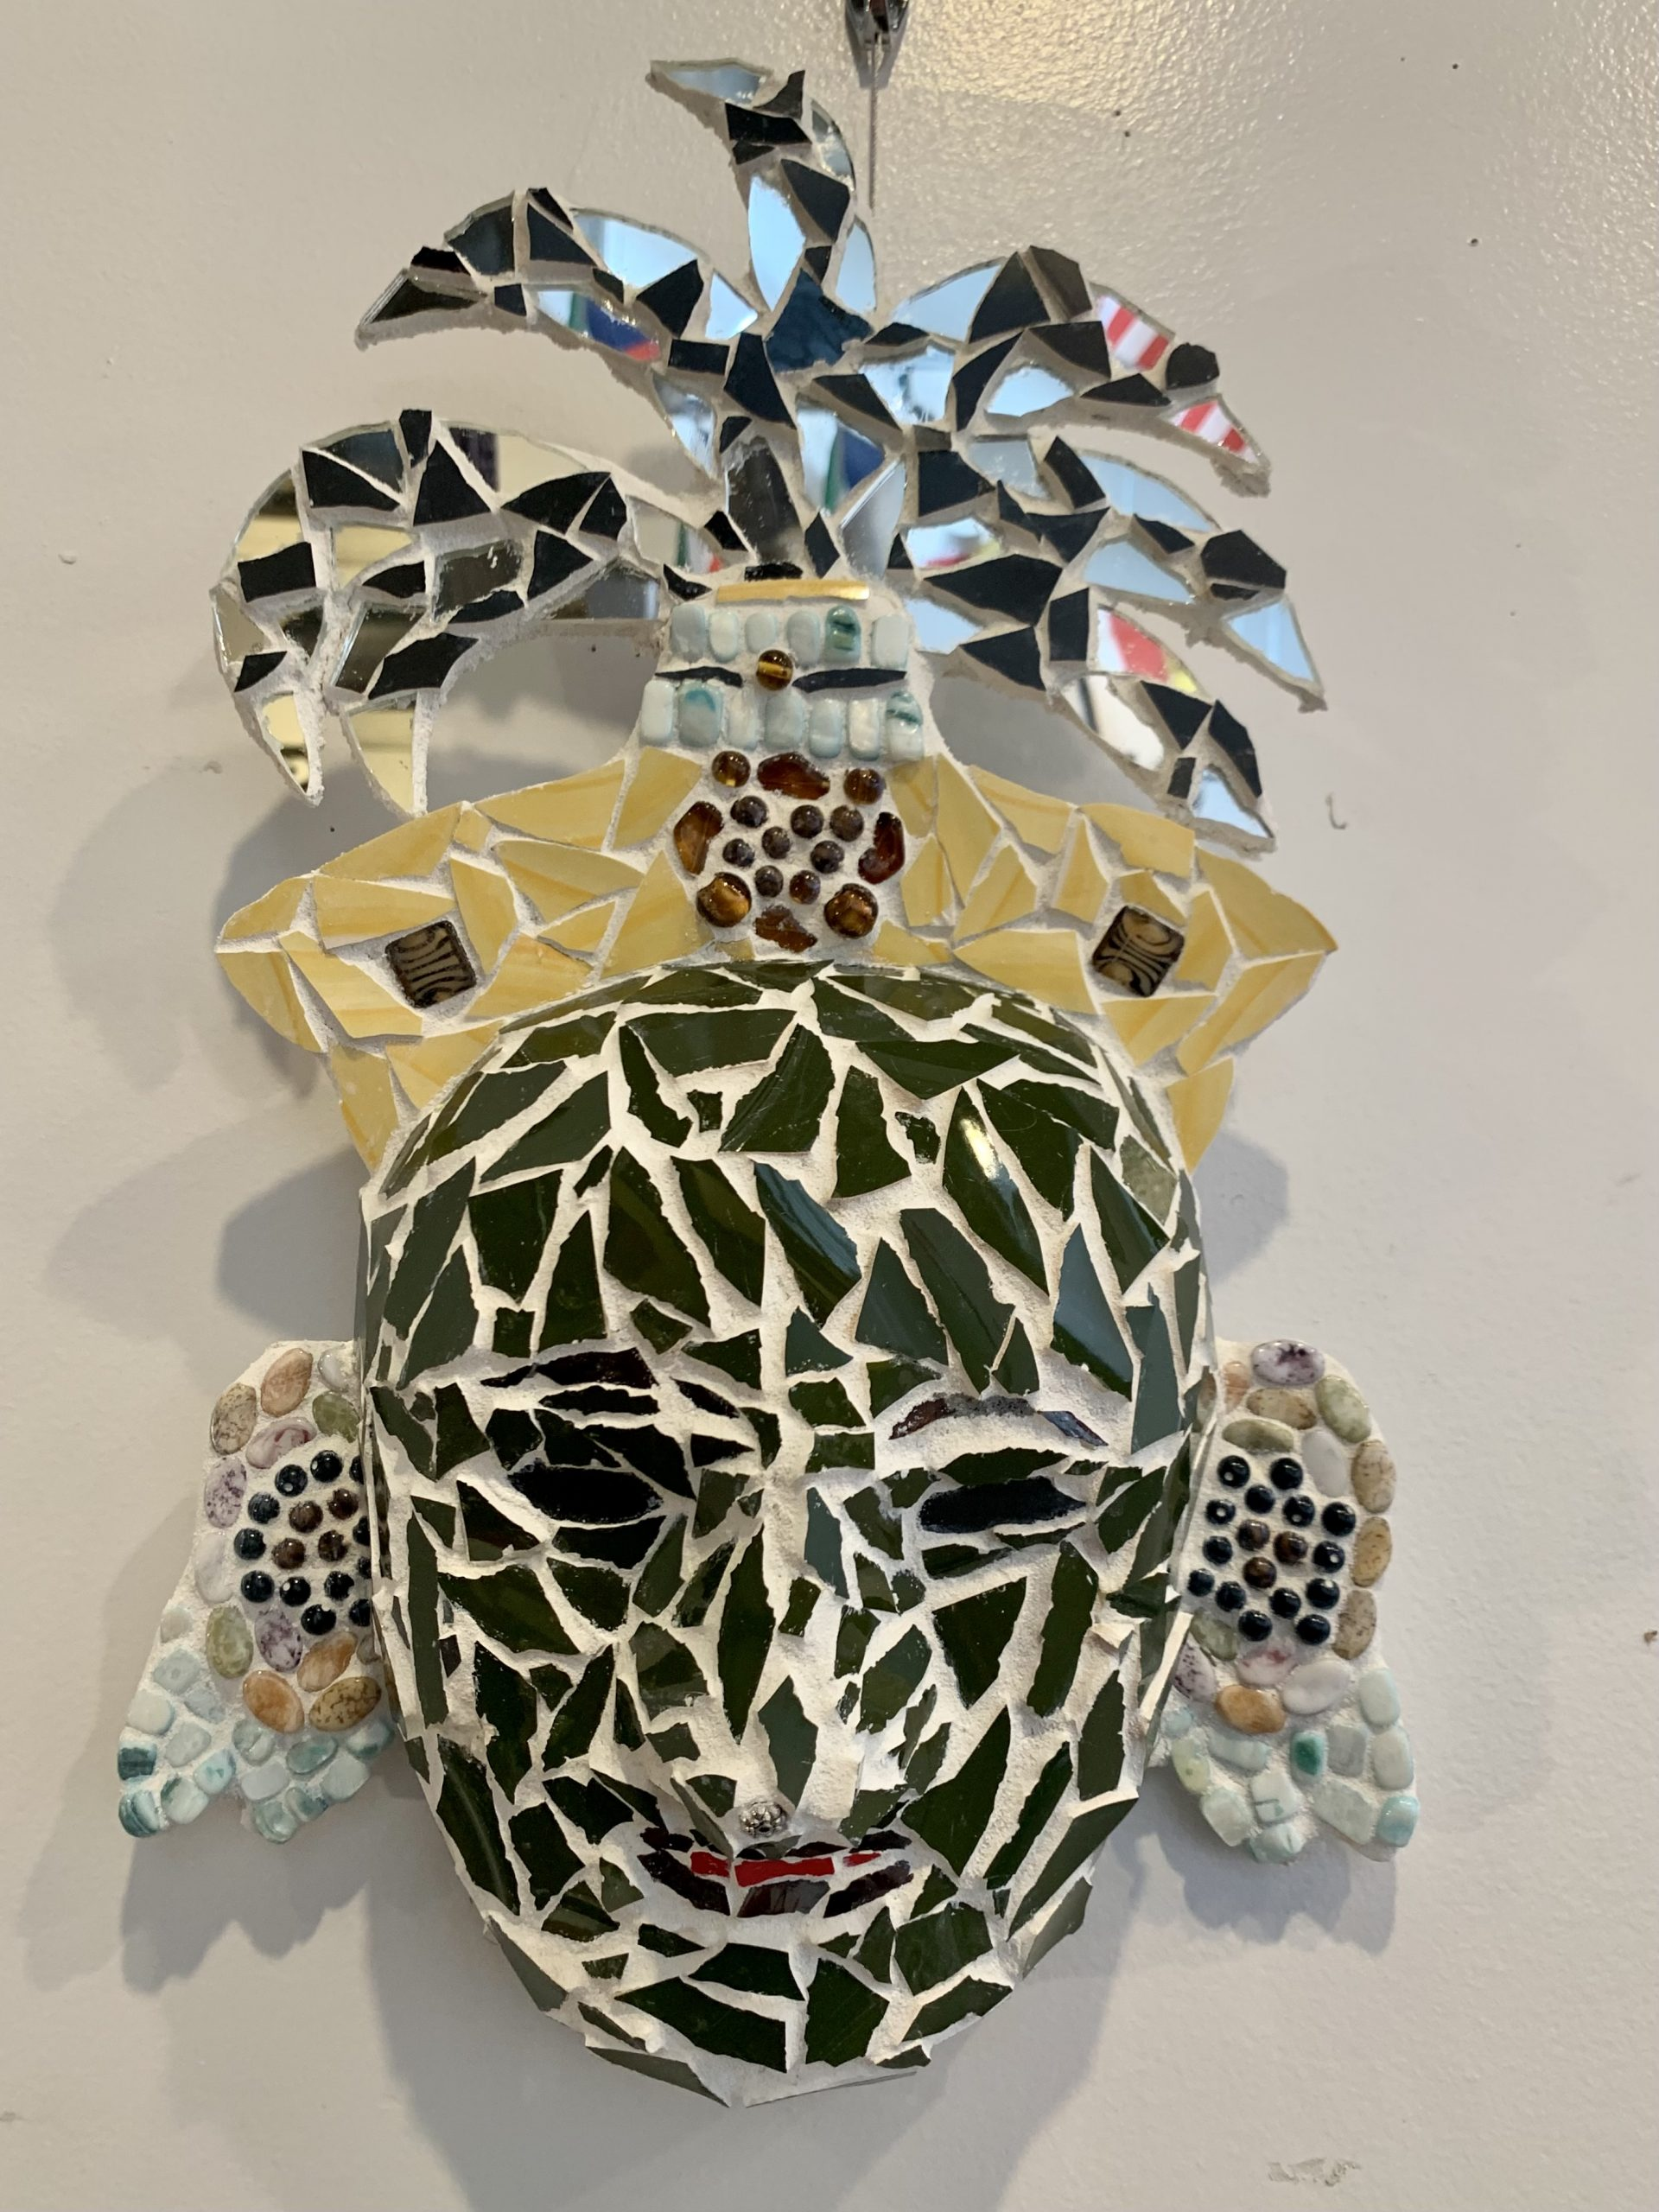 Artist #7 - Mayan Mask 1